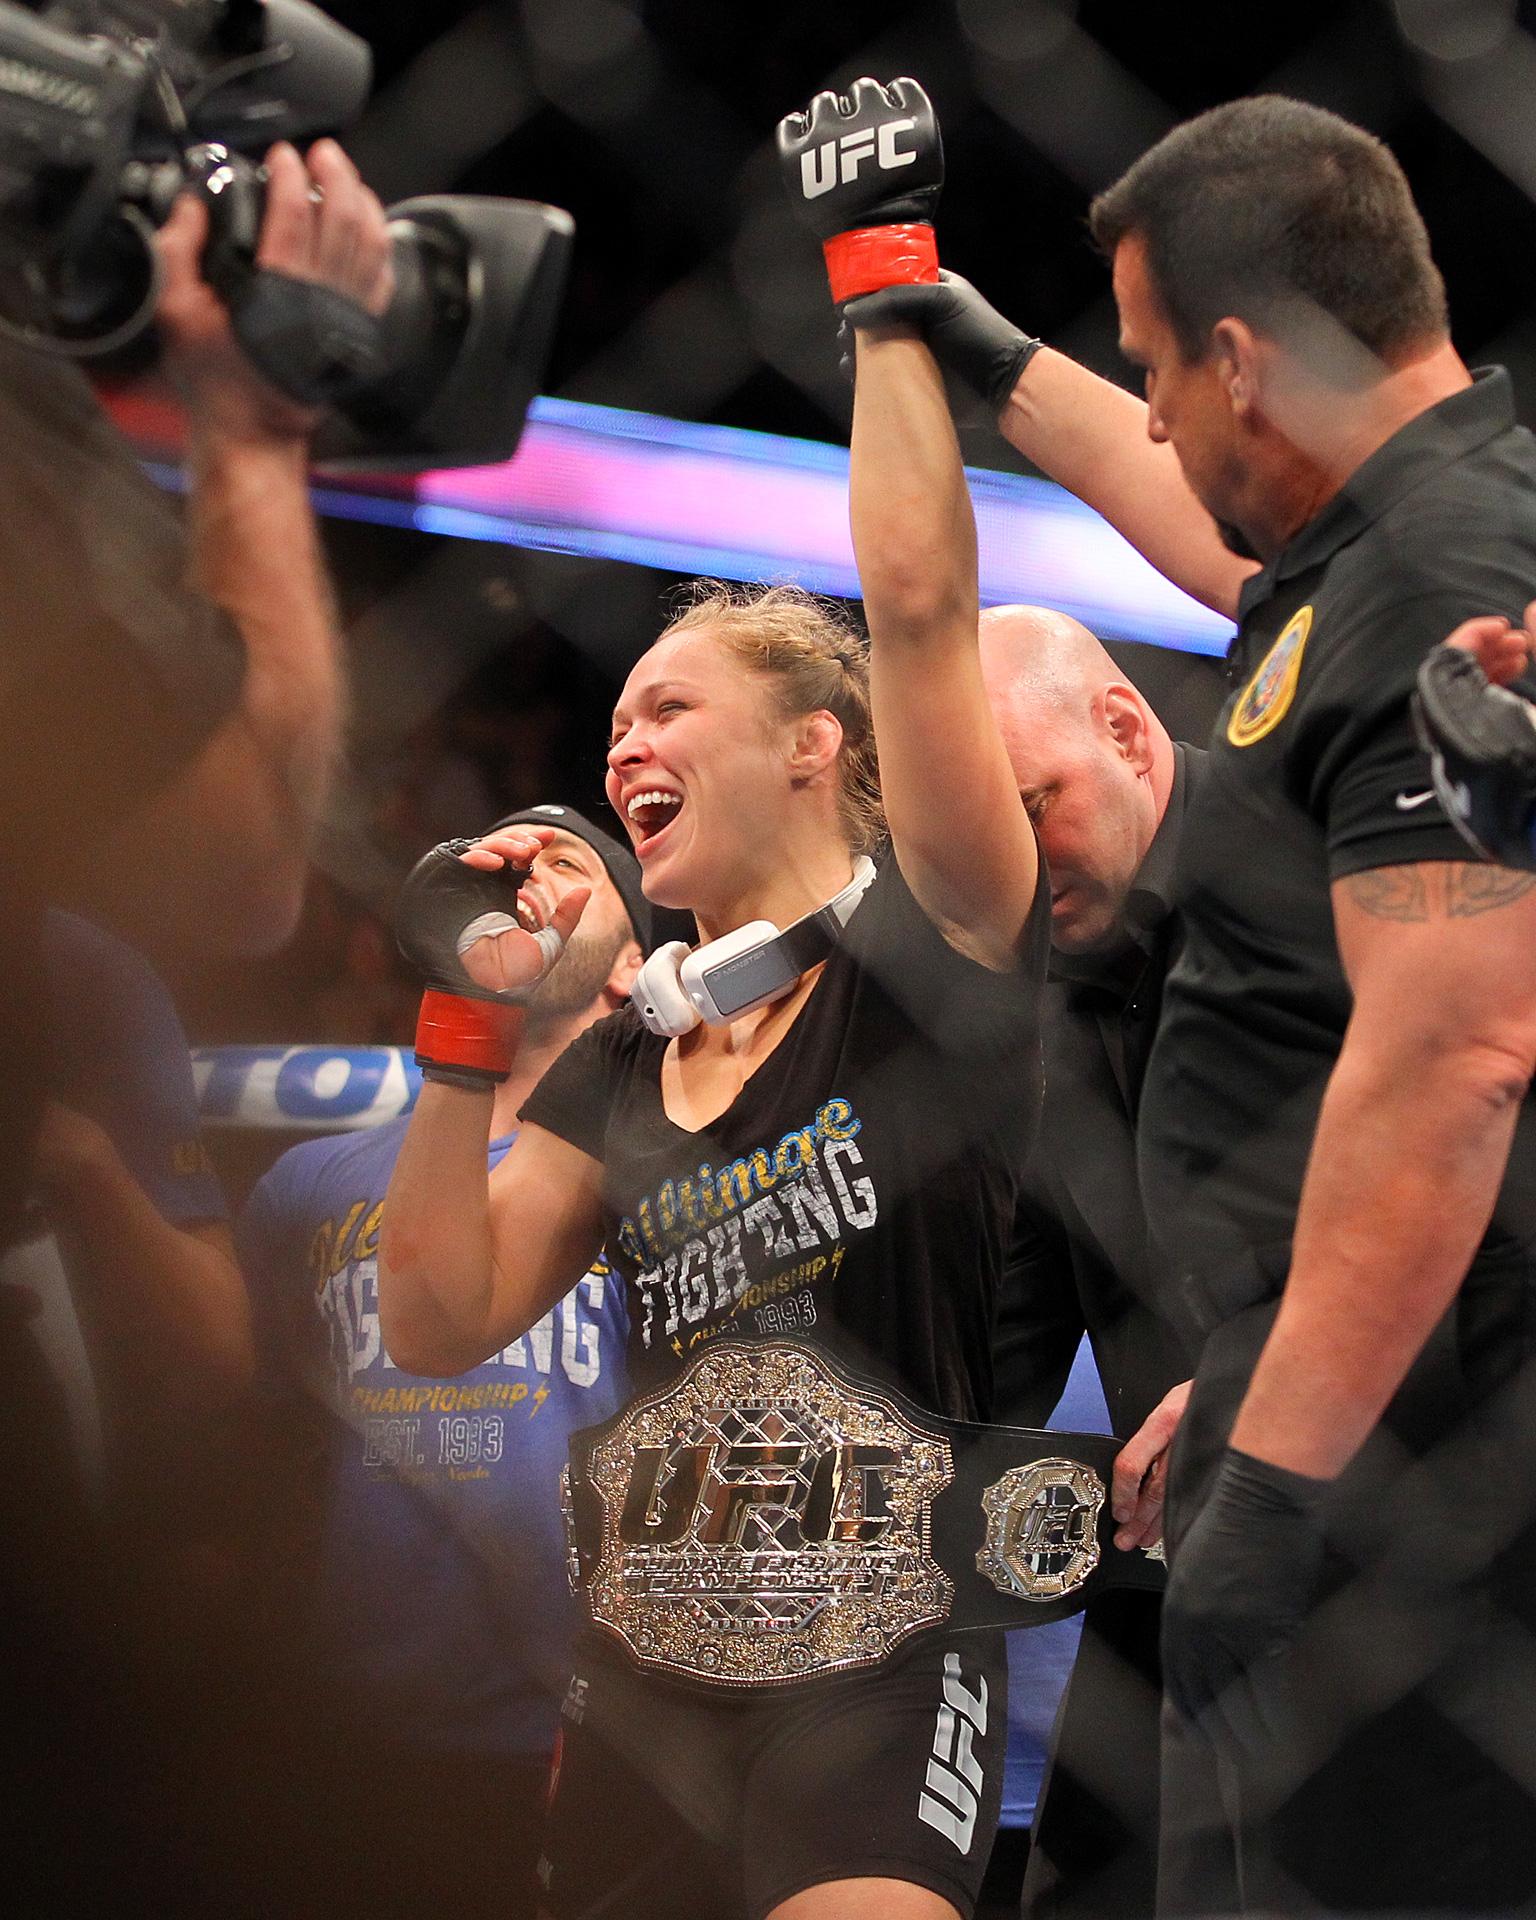 Ronda Rousey and Liz Carmouche